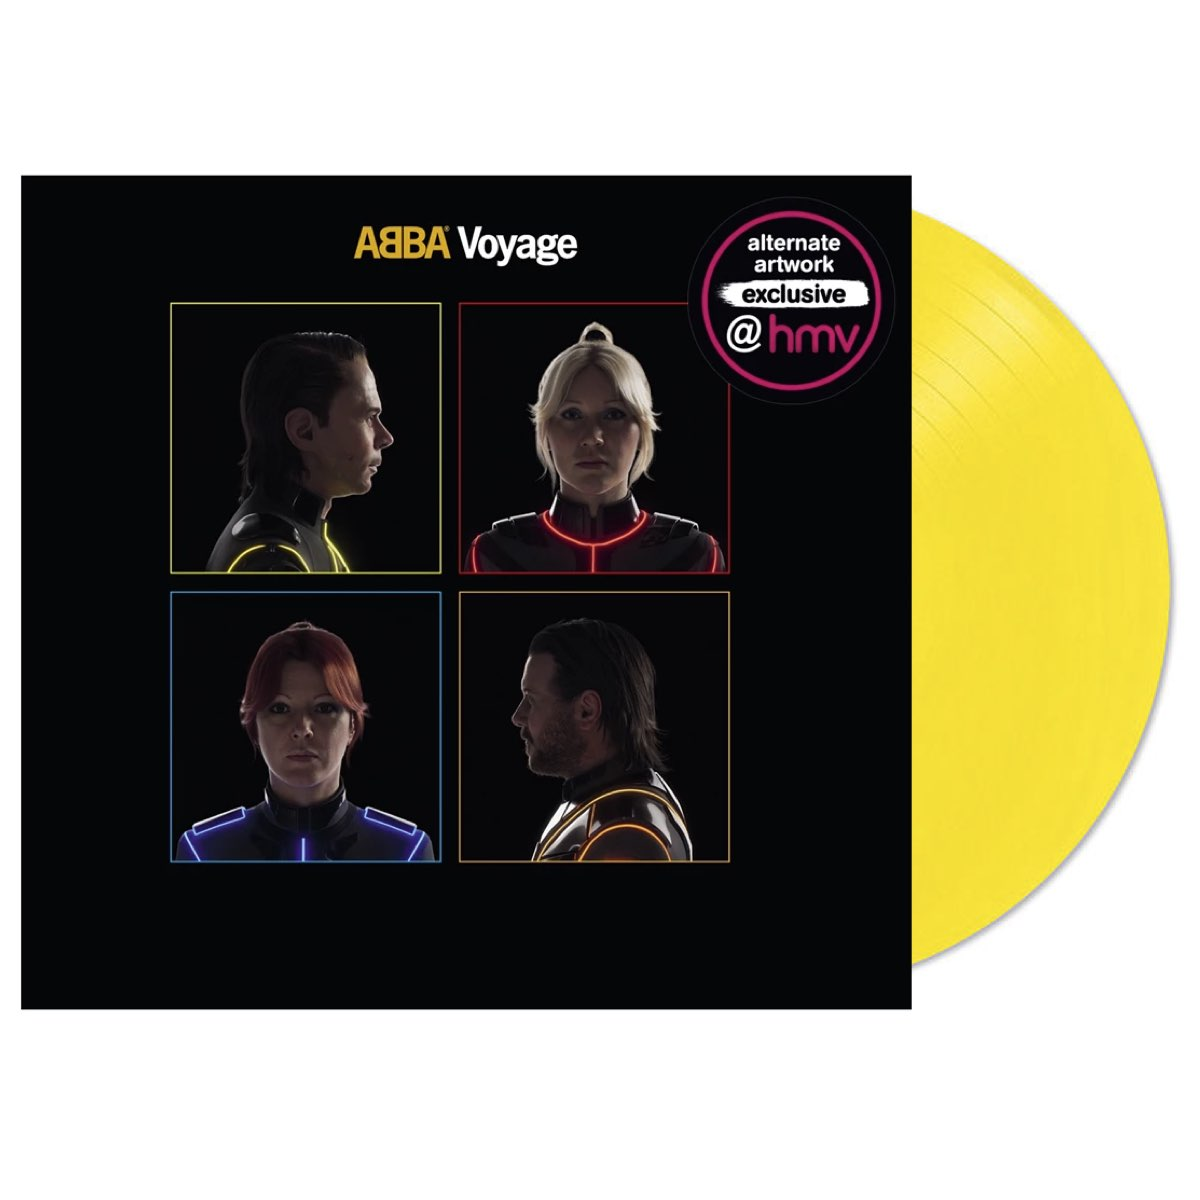 ABBA - Voyage [HMV Exclusive] Yellow Vinyl